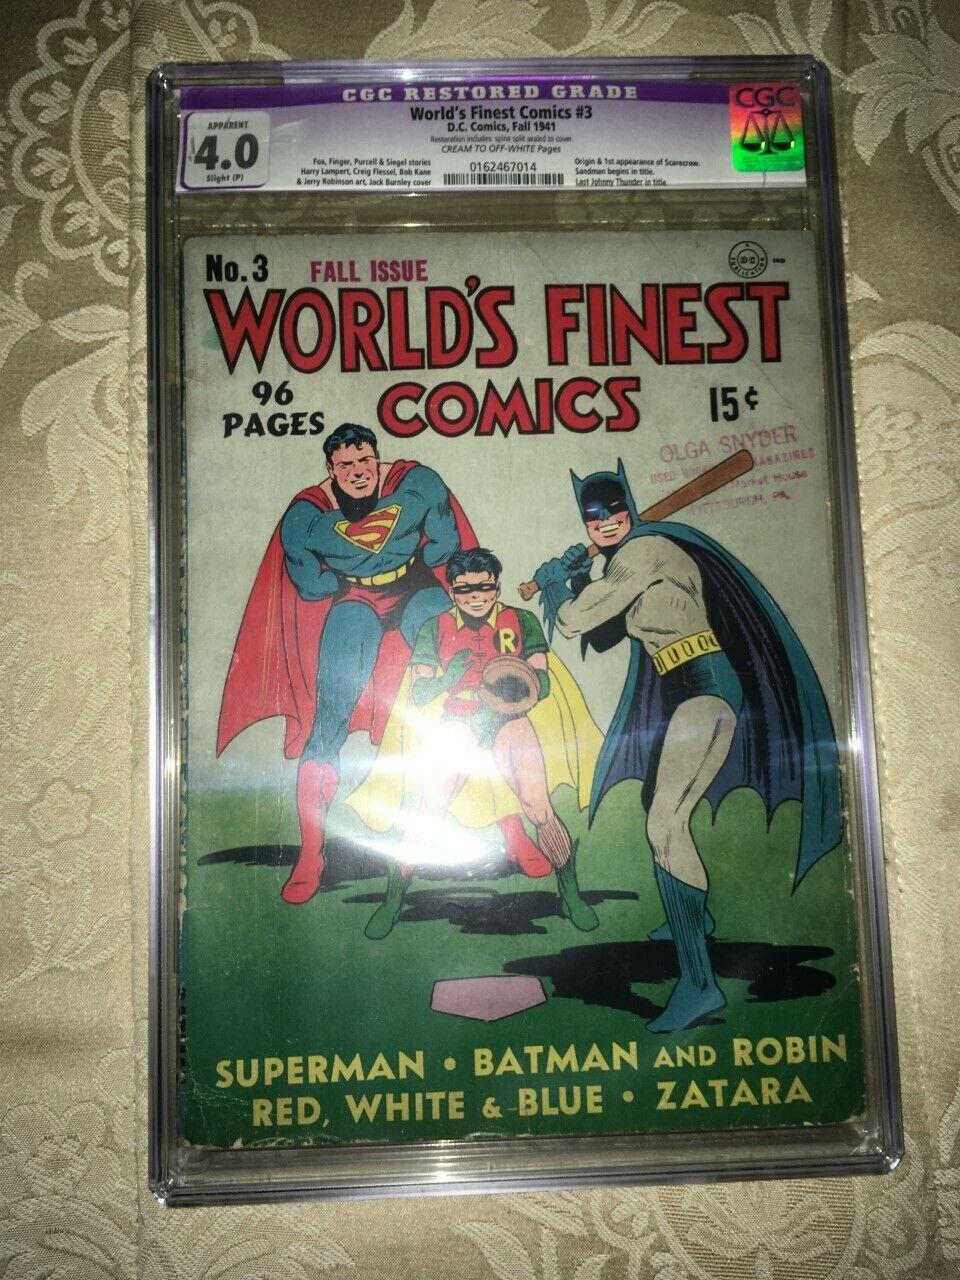 Worlds Finest Comics 3 CGC Restored Grade 40 DC Comics Fall 1941